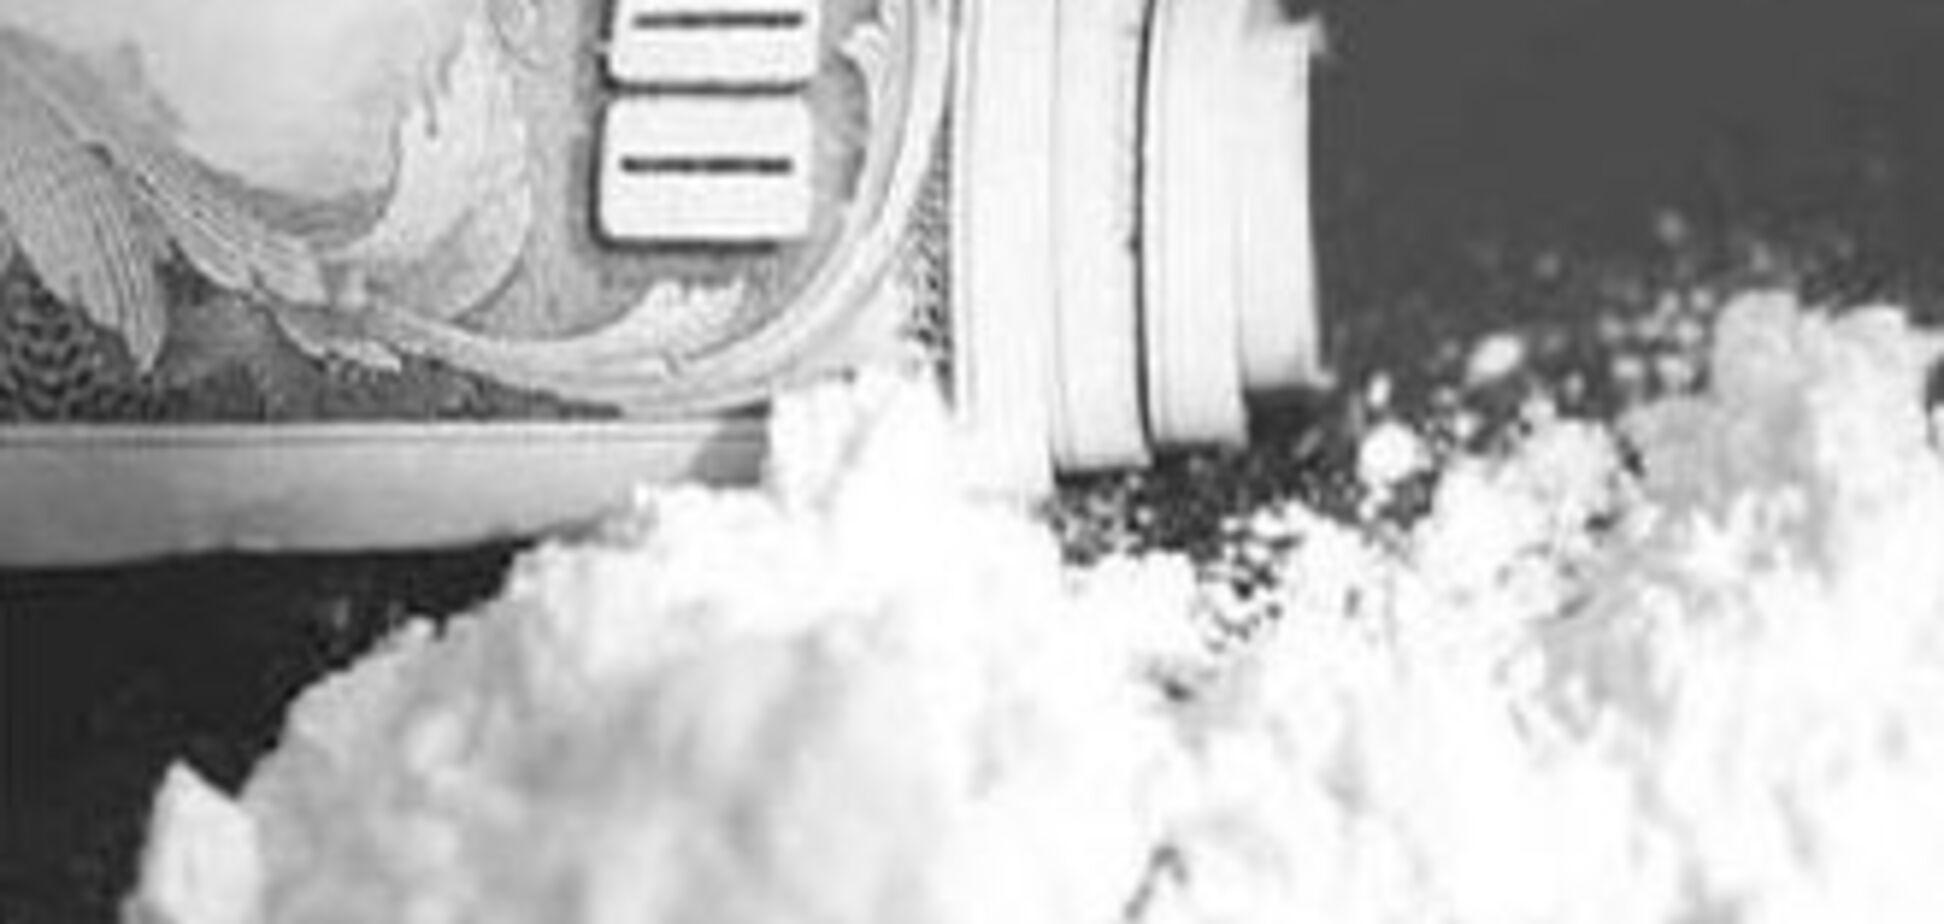 В Україну везли дошки, які виявилися ... кокаїном!